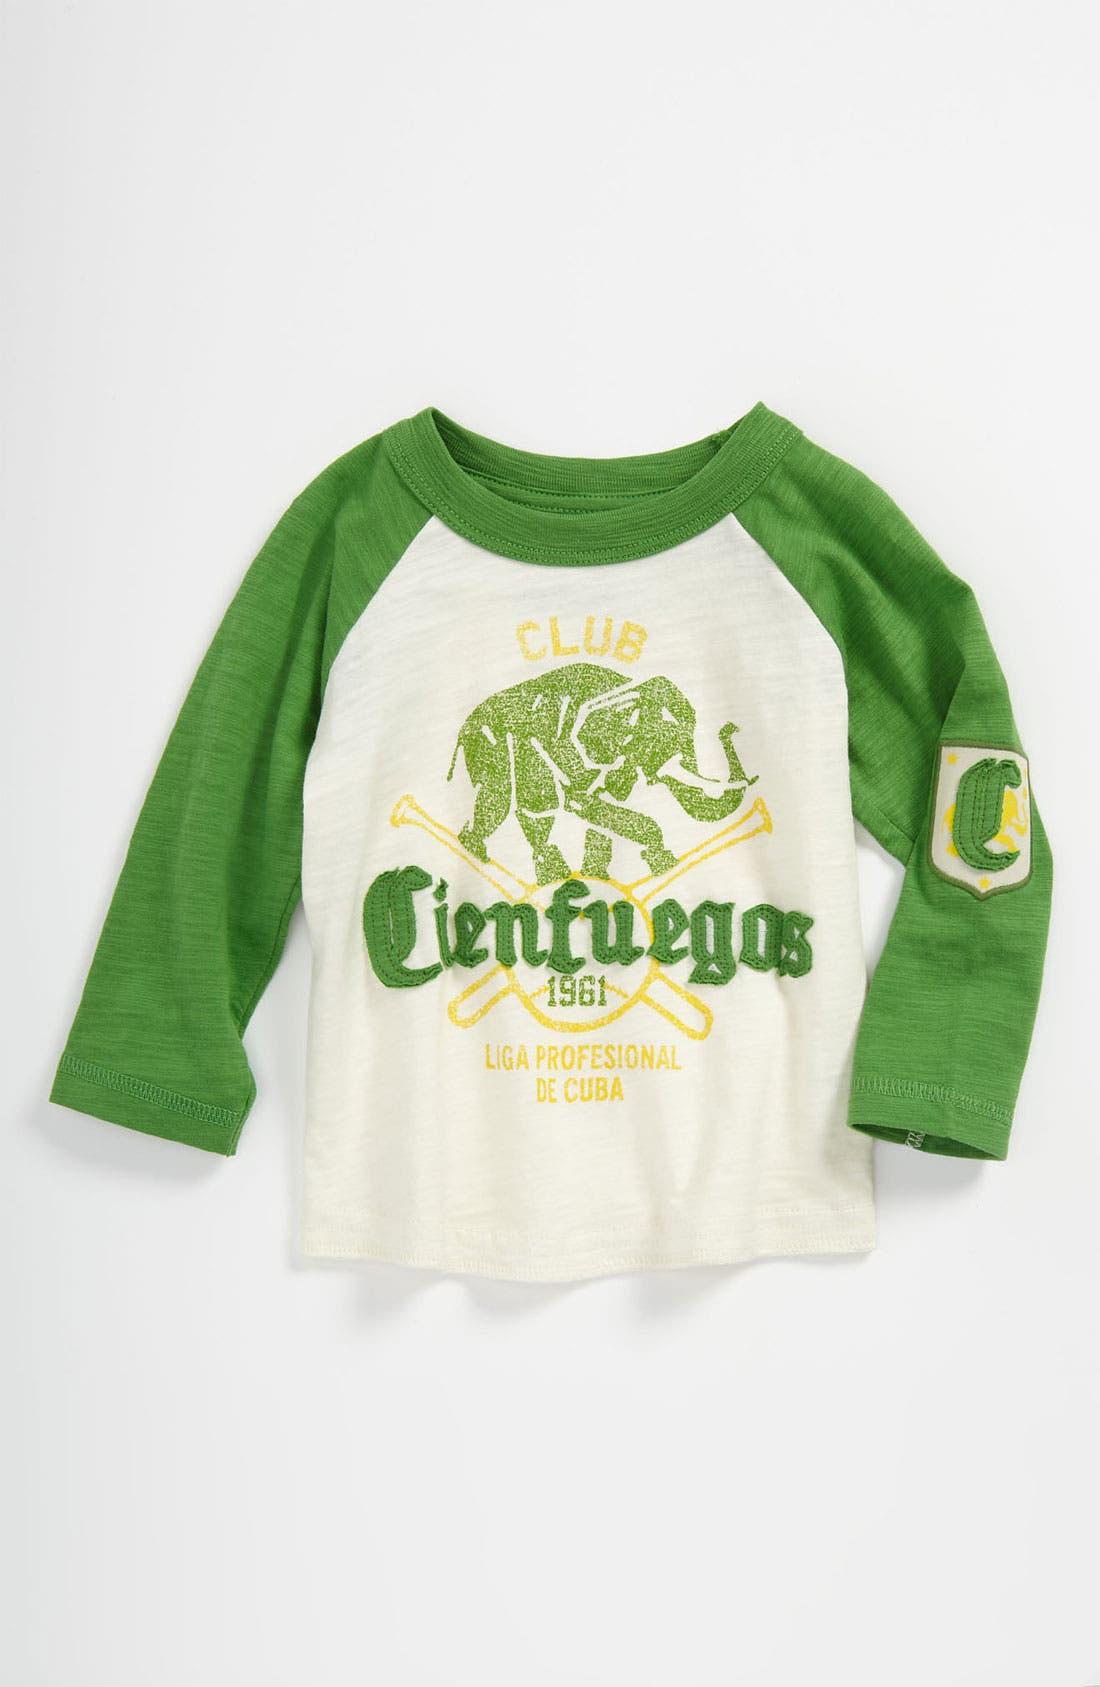 Main Image - Peek 'Club Cienfuegos' Baseball Jersey T-Shirt (Baby)